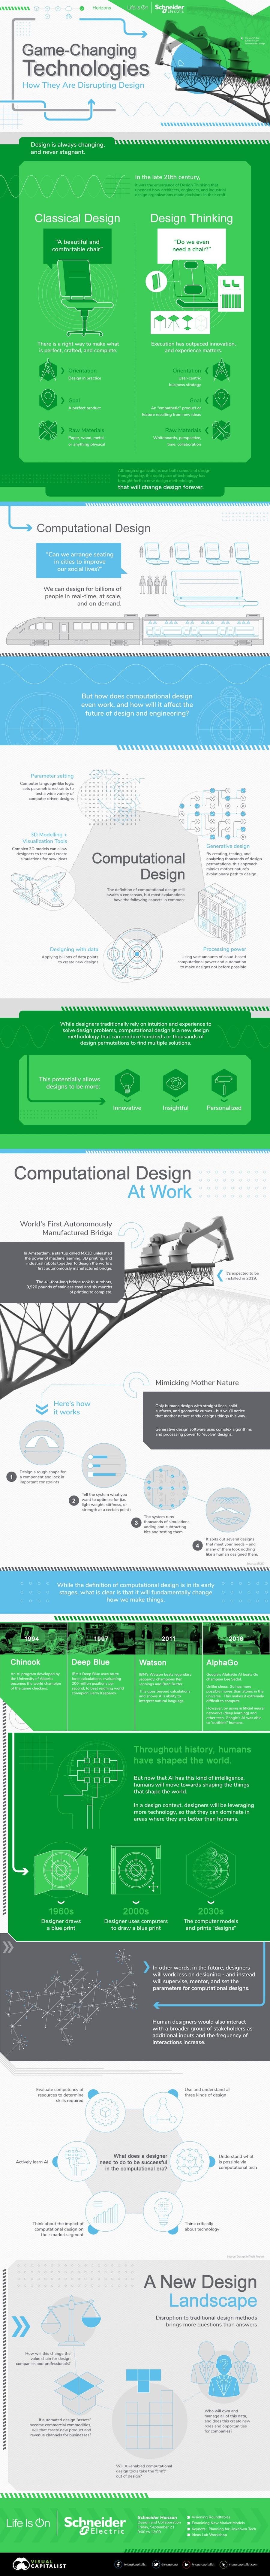 Technologies Disrupting info